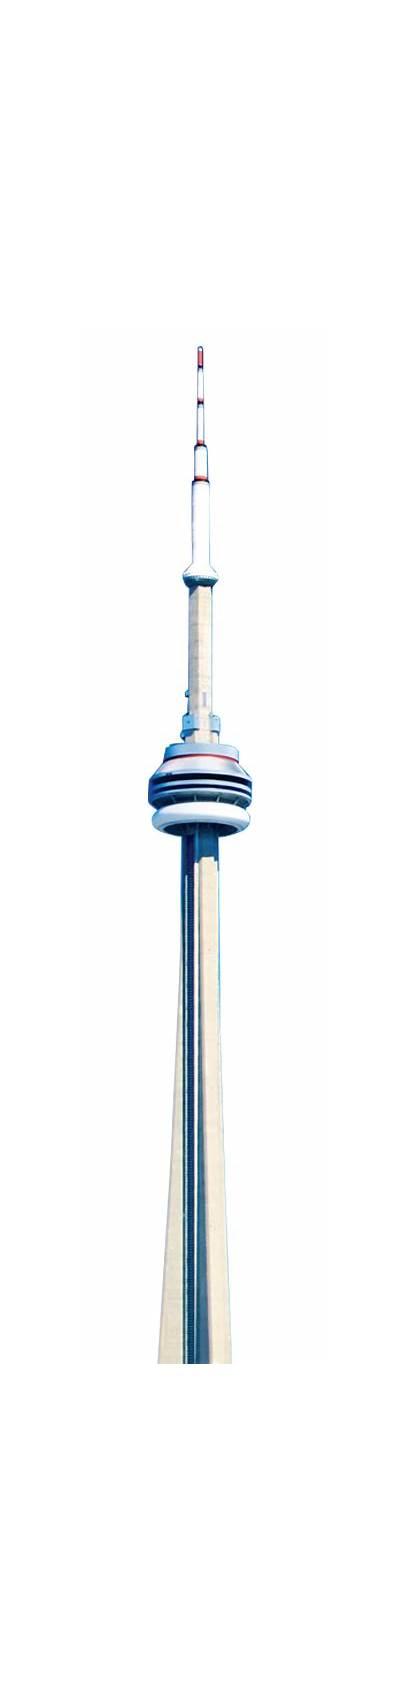 Tower Cn Walk Edge Toronto Canada Below